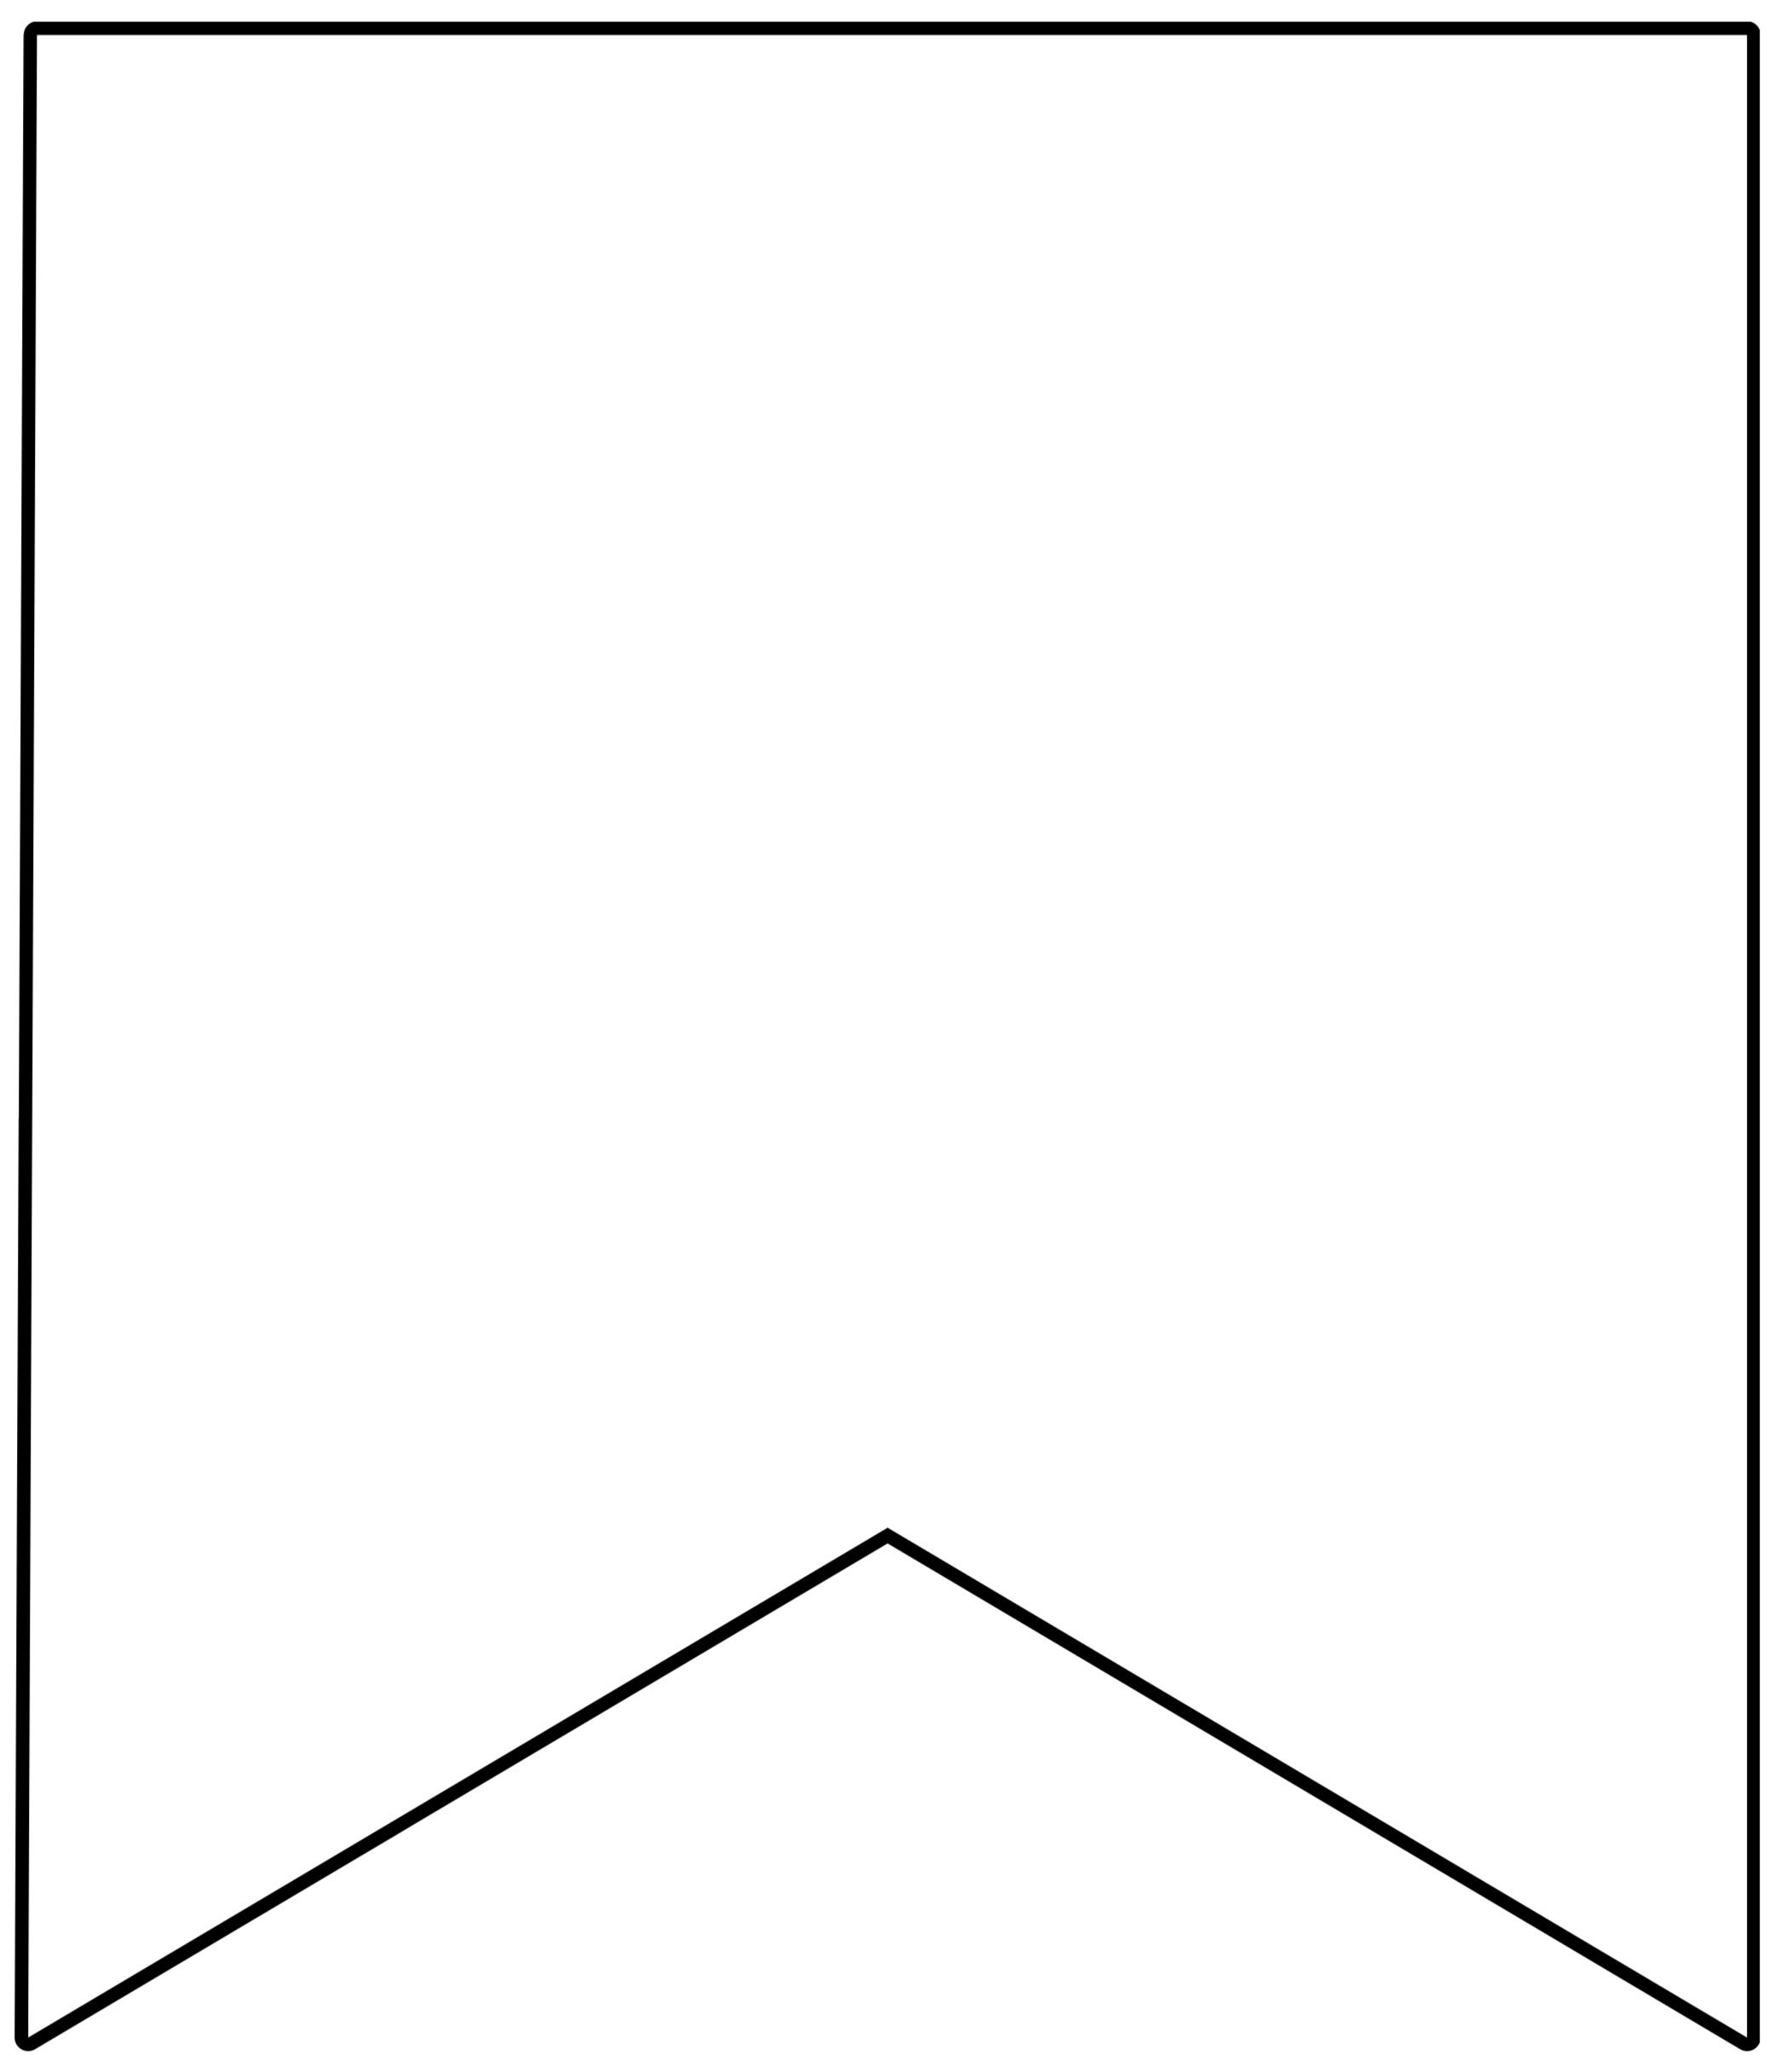 Template Printable Pennant Banner Epp Acp Info Free